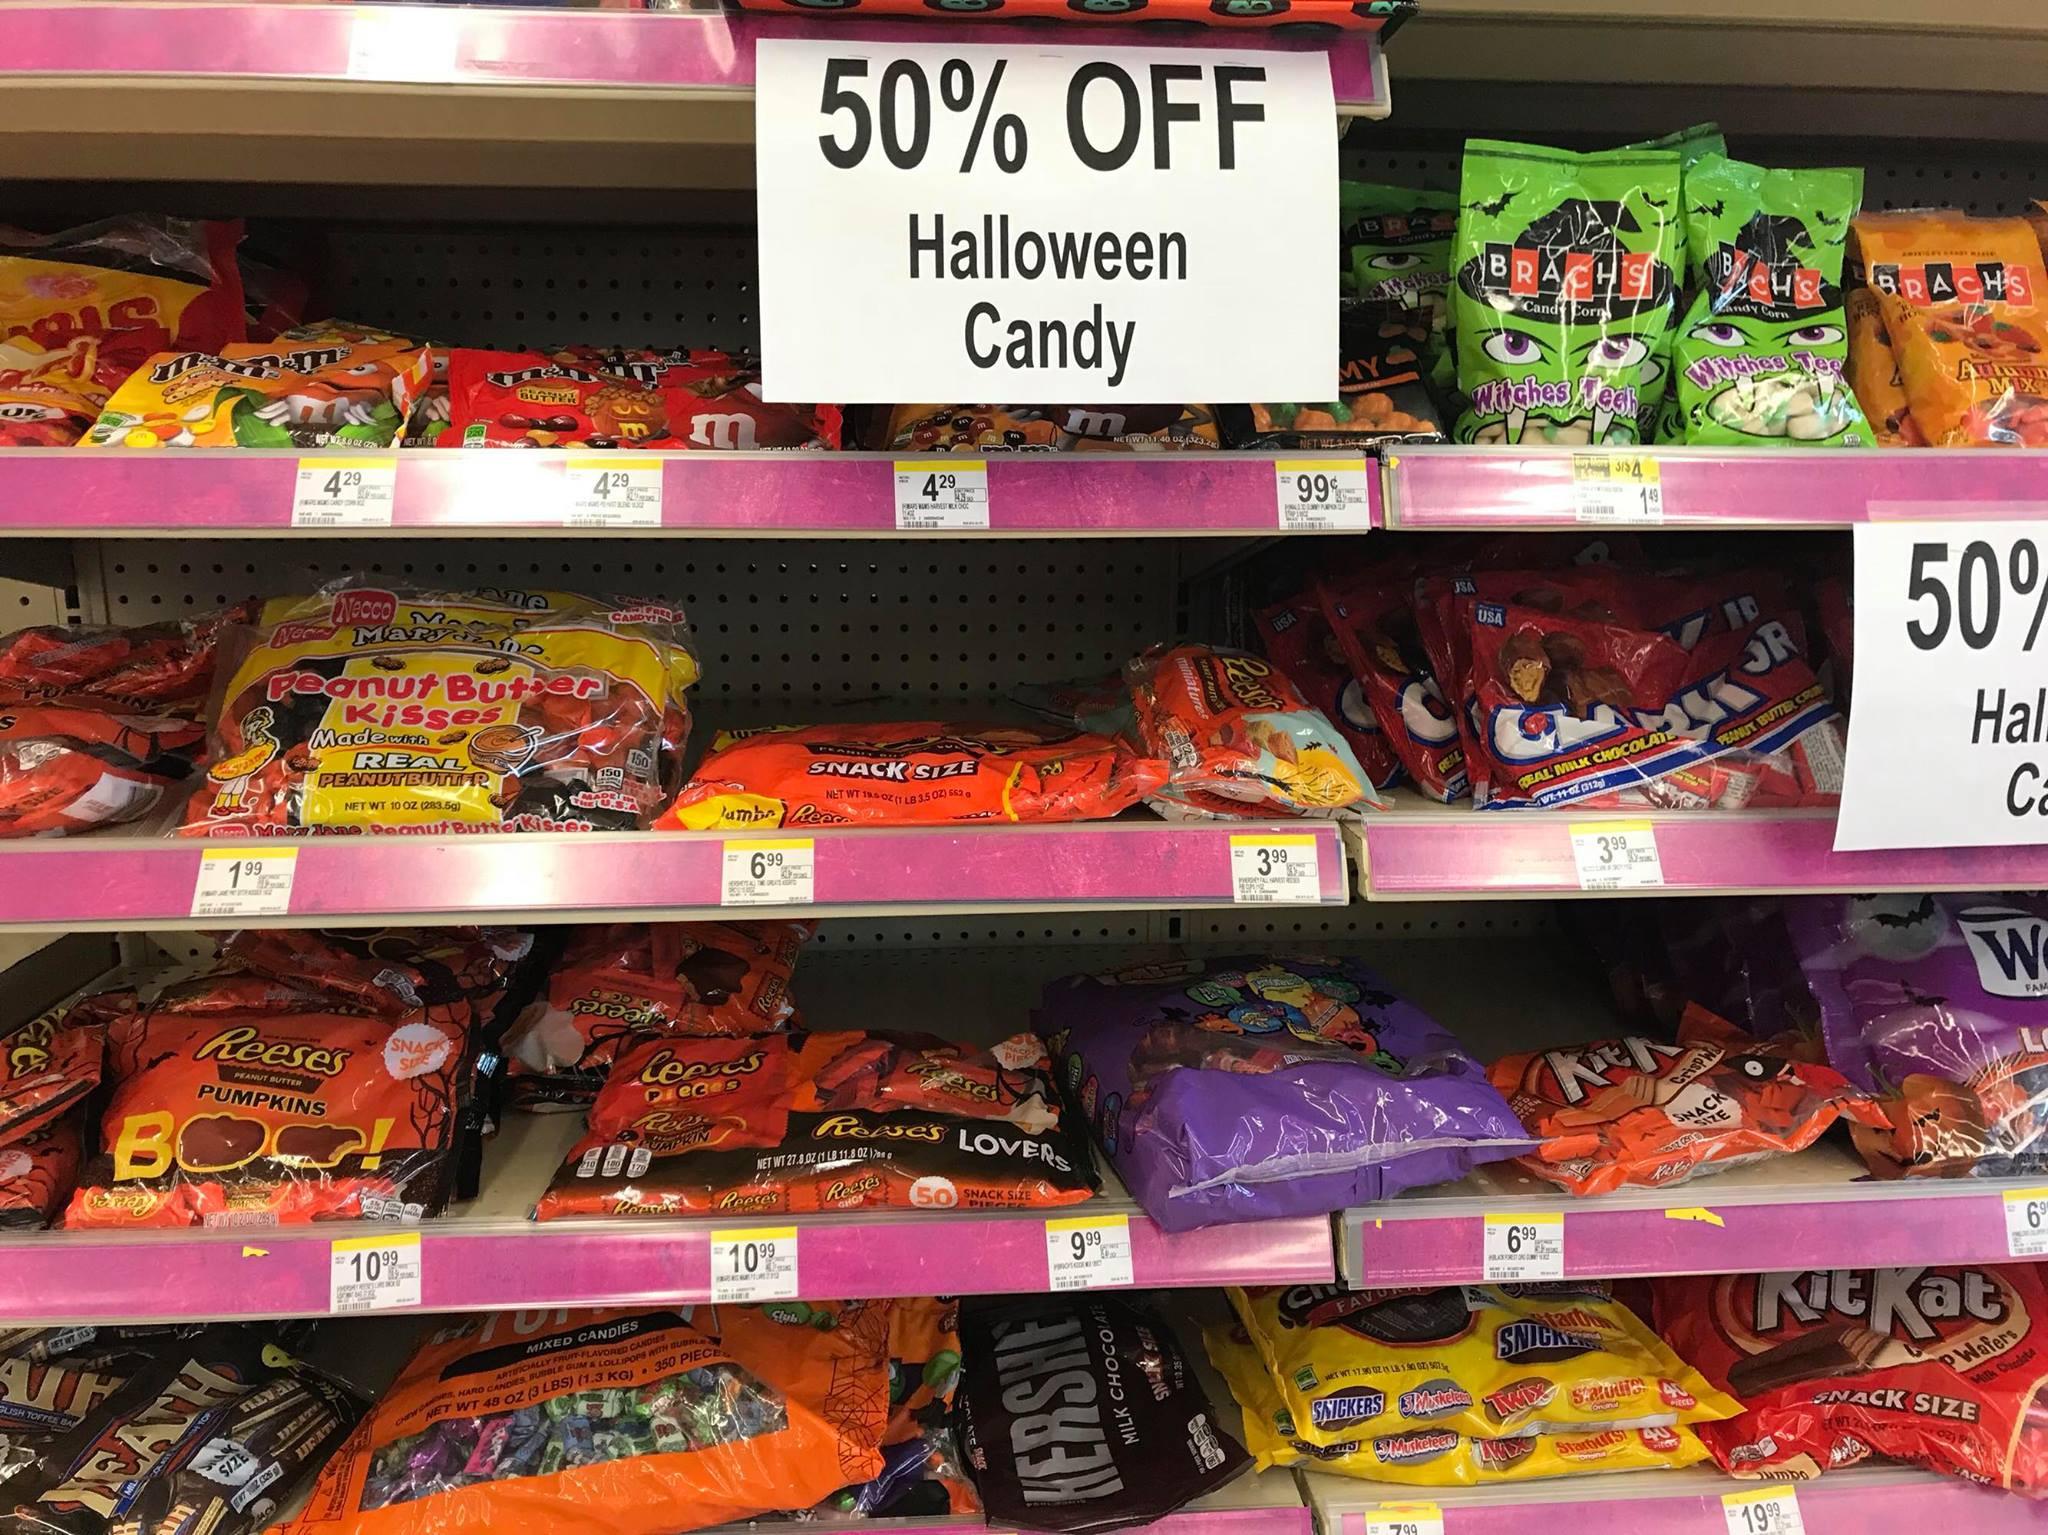 Walgreens Christmas Candy  Walgreens off Halloween Candy & Decor